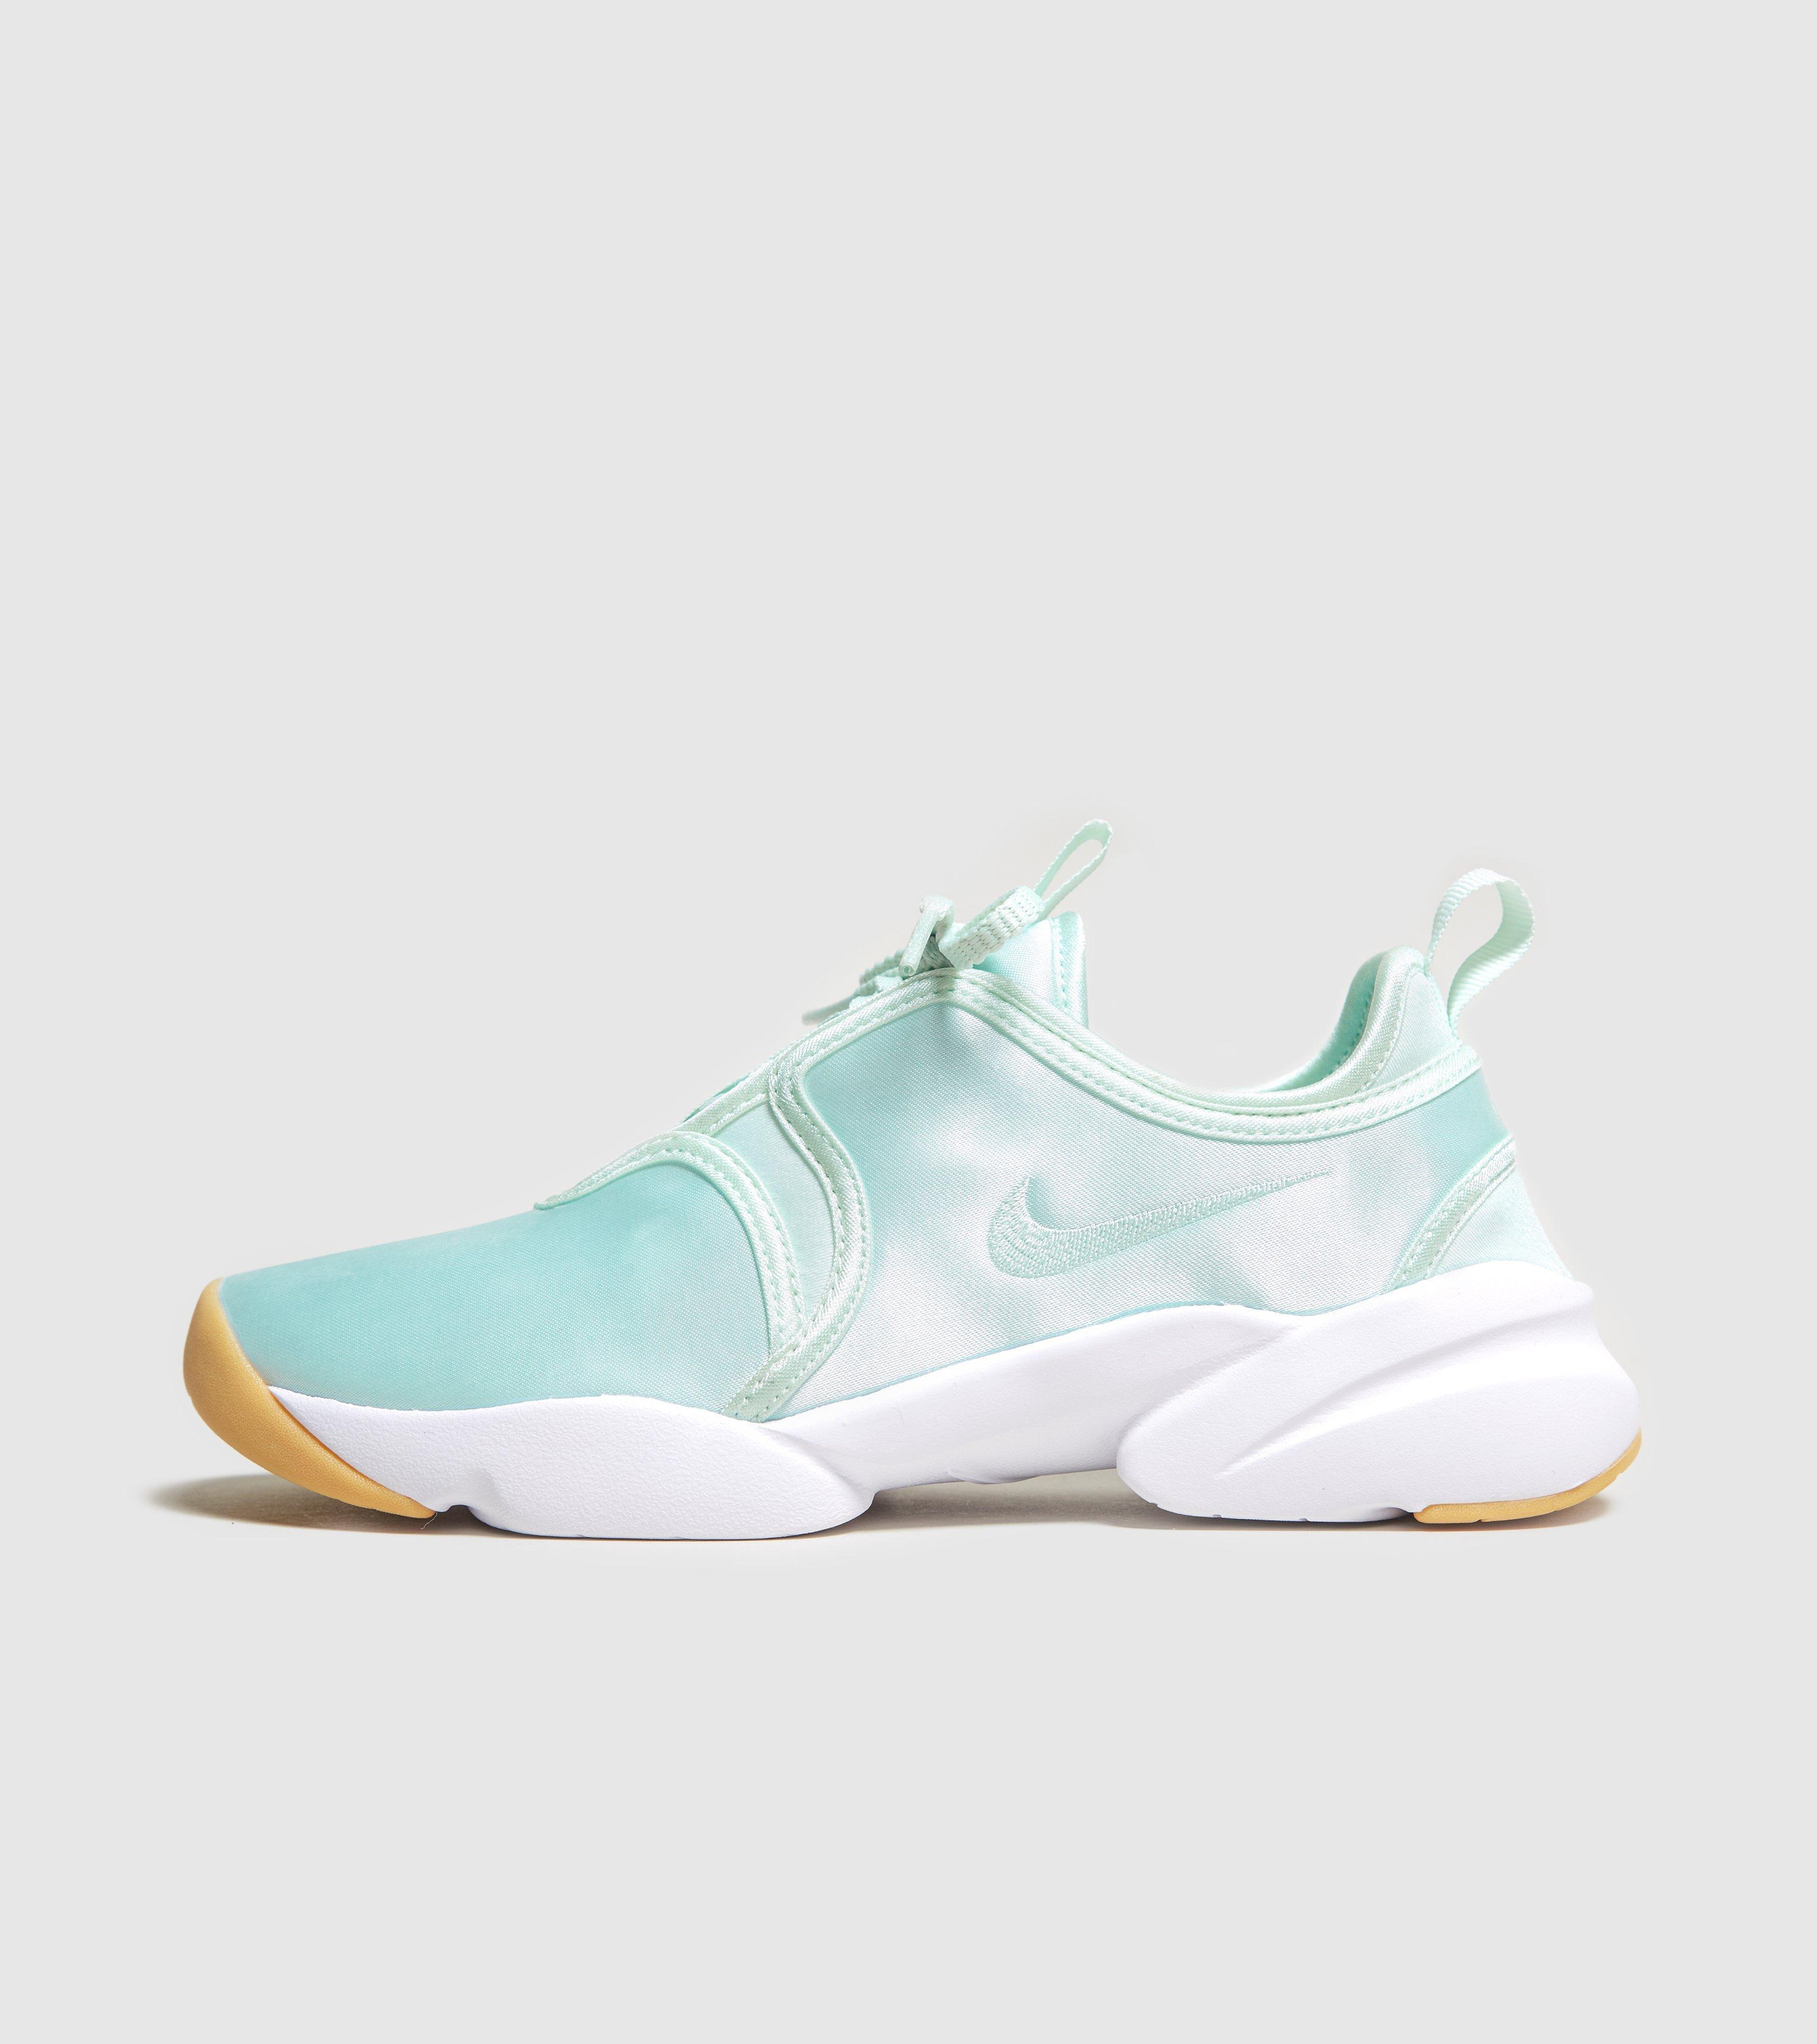 Nike Women S Shoes Pastel Outsole